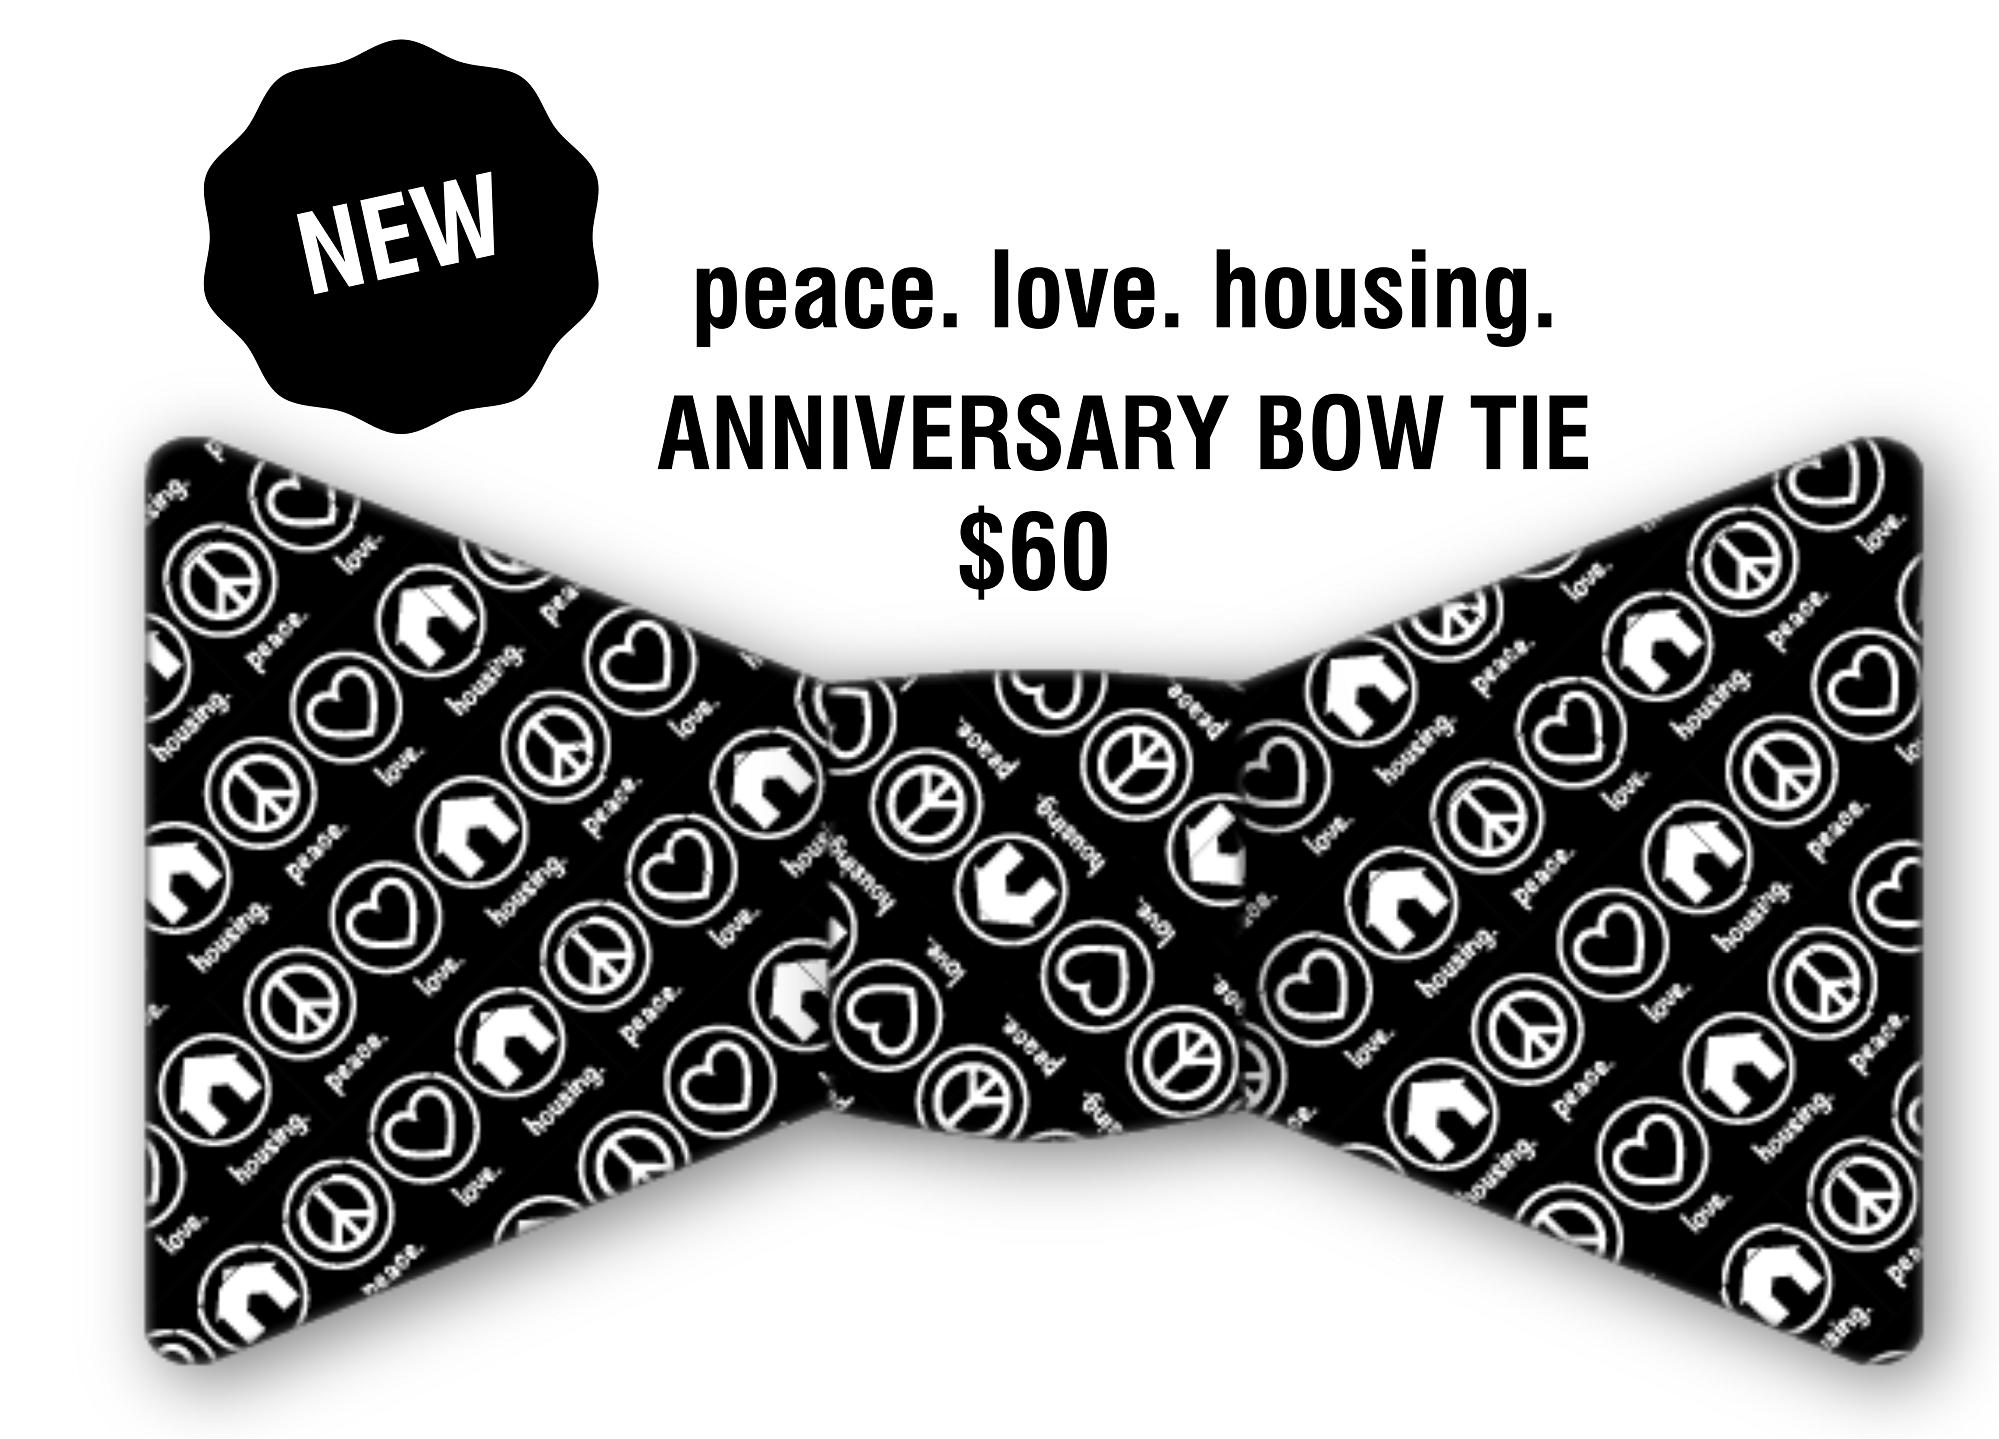 Bow Tie Website Image